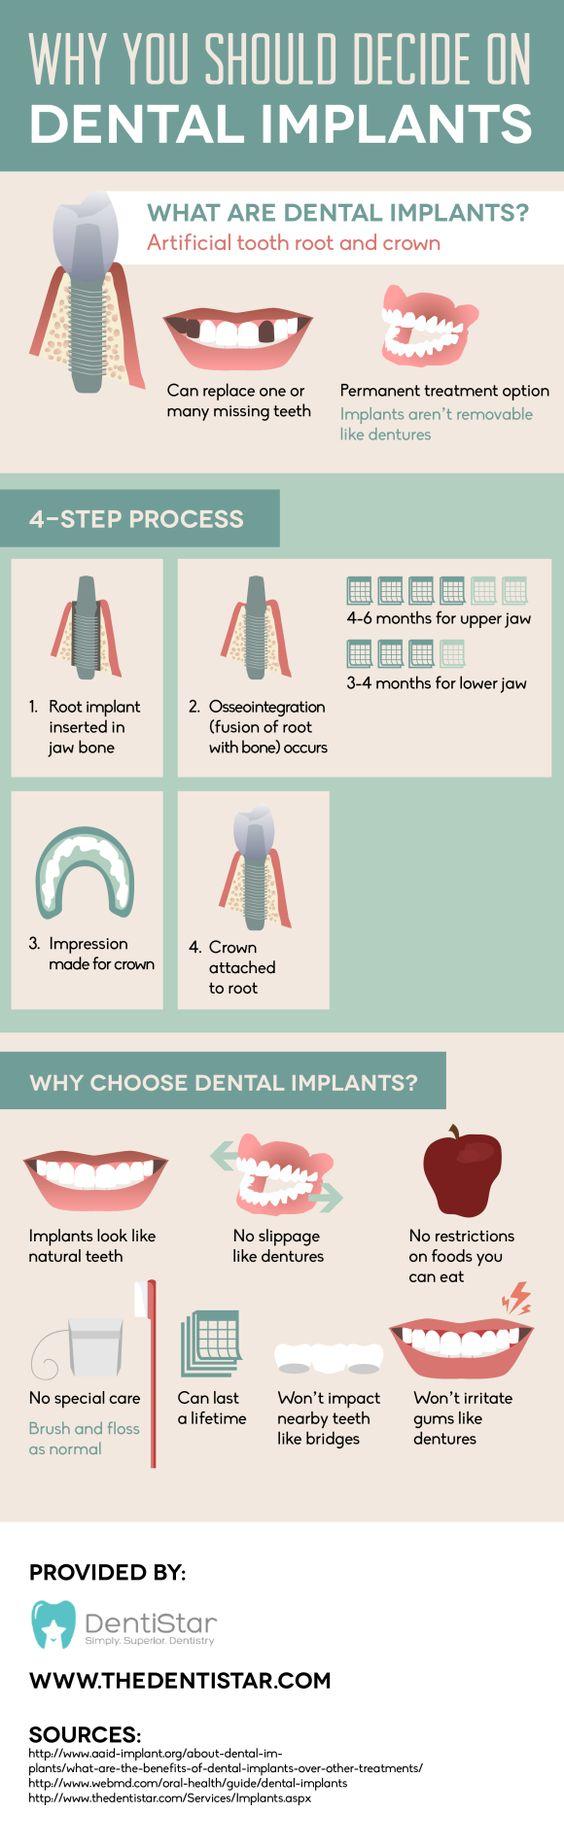 Why you should decide on dental implants